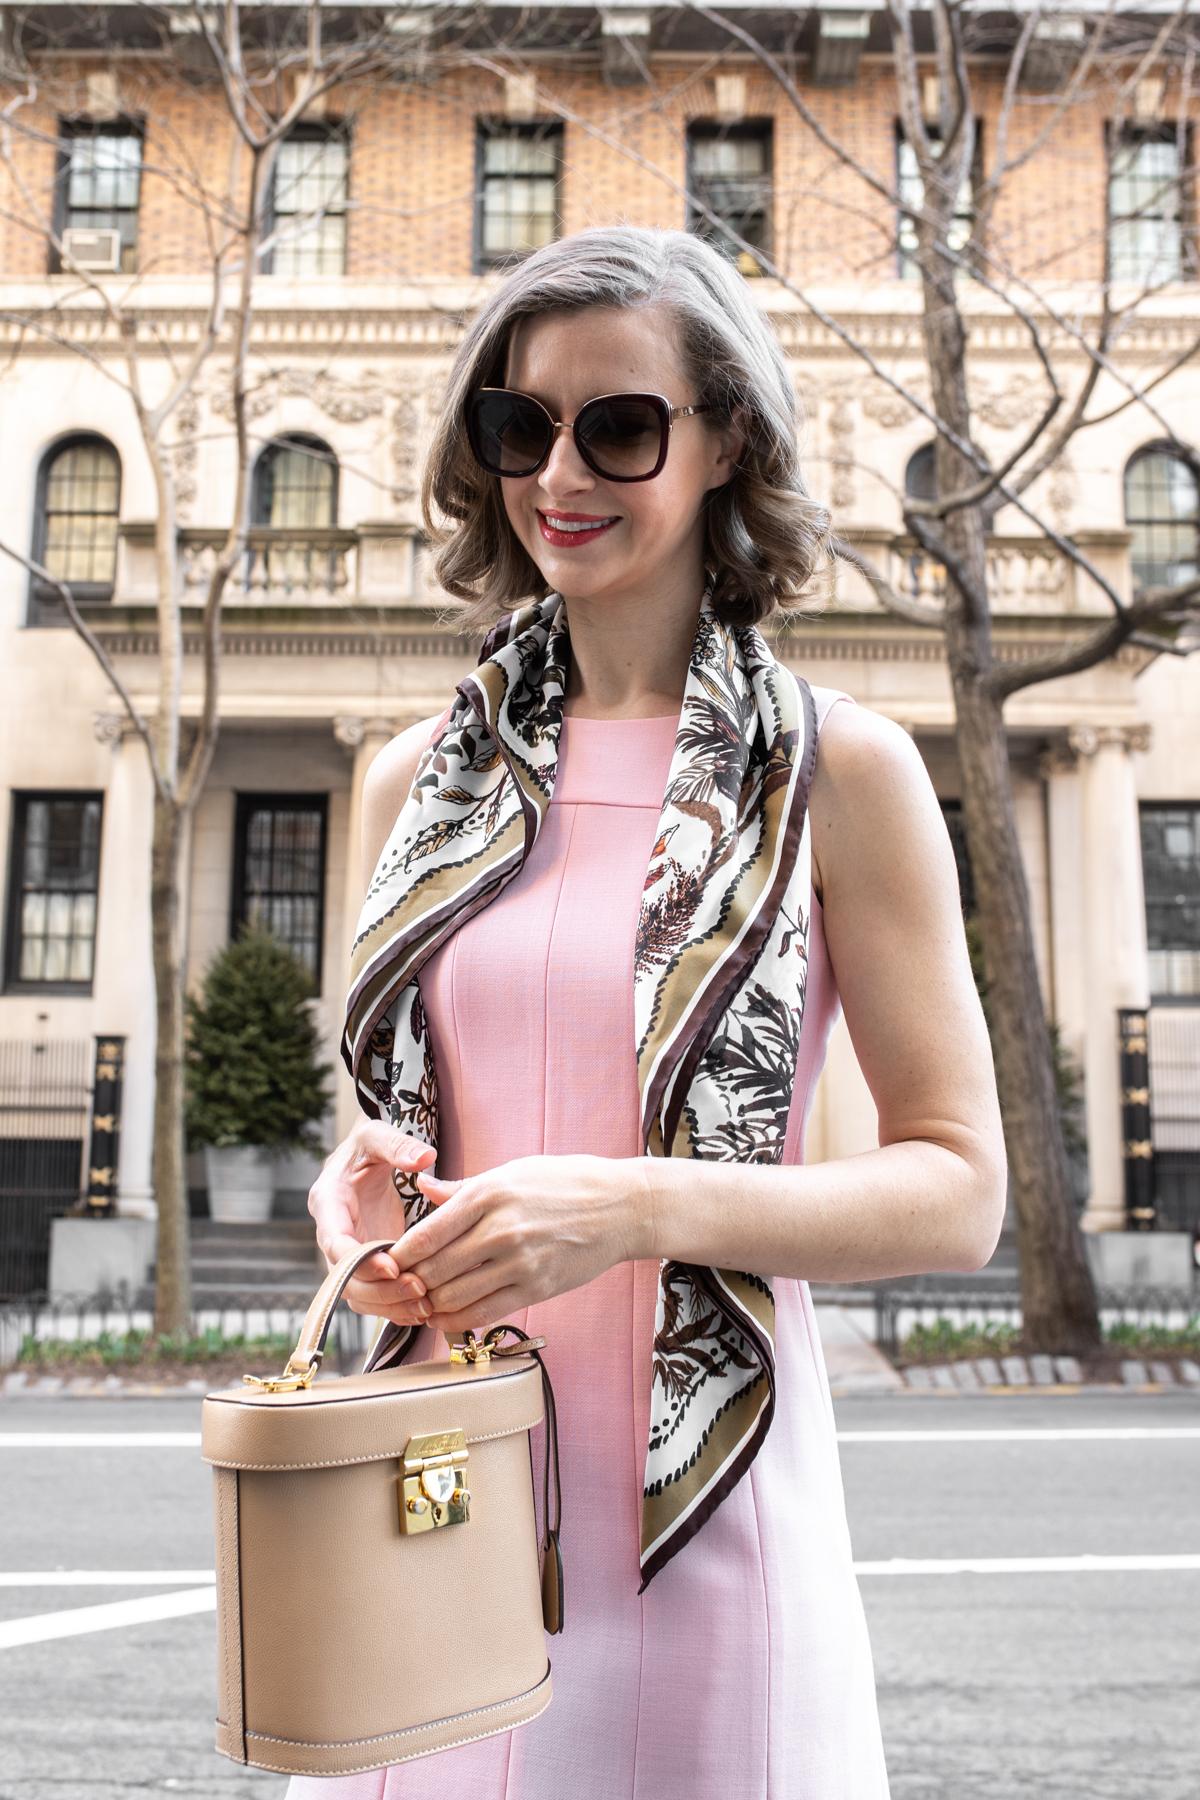 Stacie Flinner How to Style a Silk Scarf-13.jpg